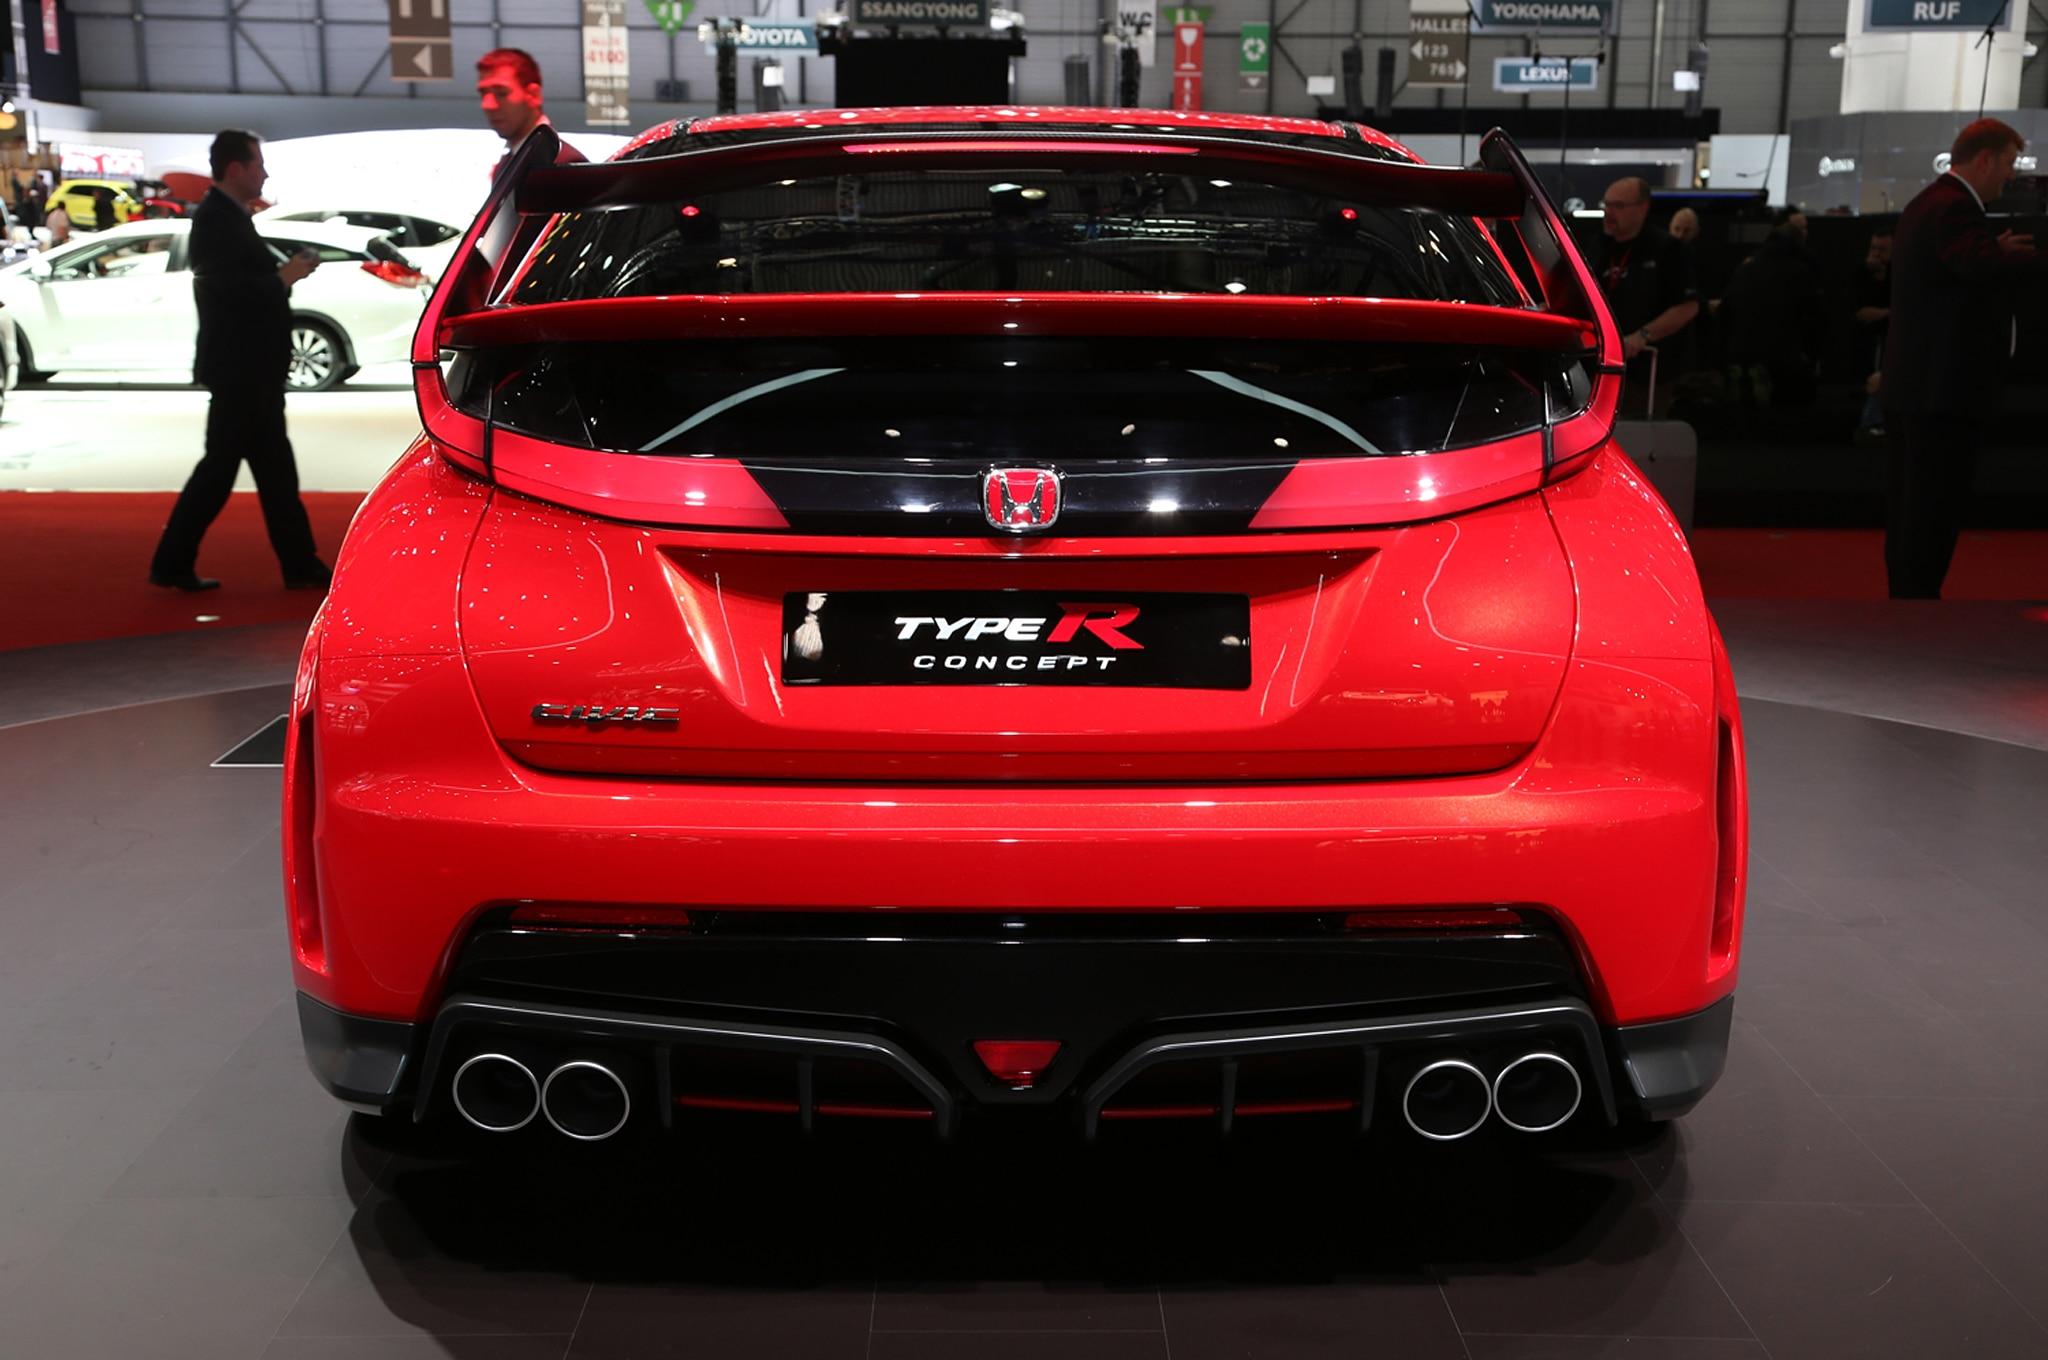 Production Honda Civic Type R Debuts at Geneva Auto Show